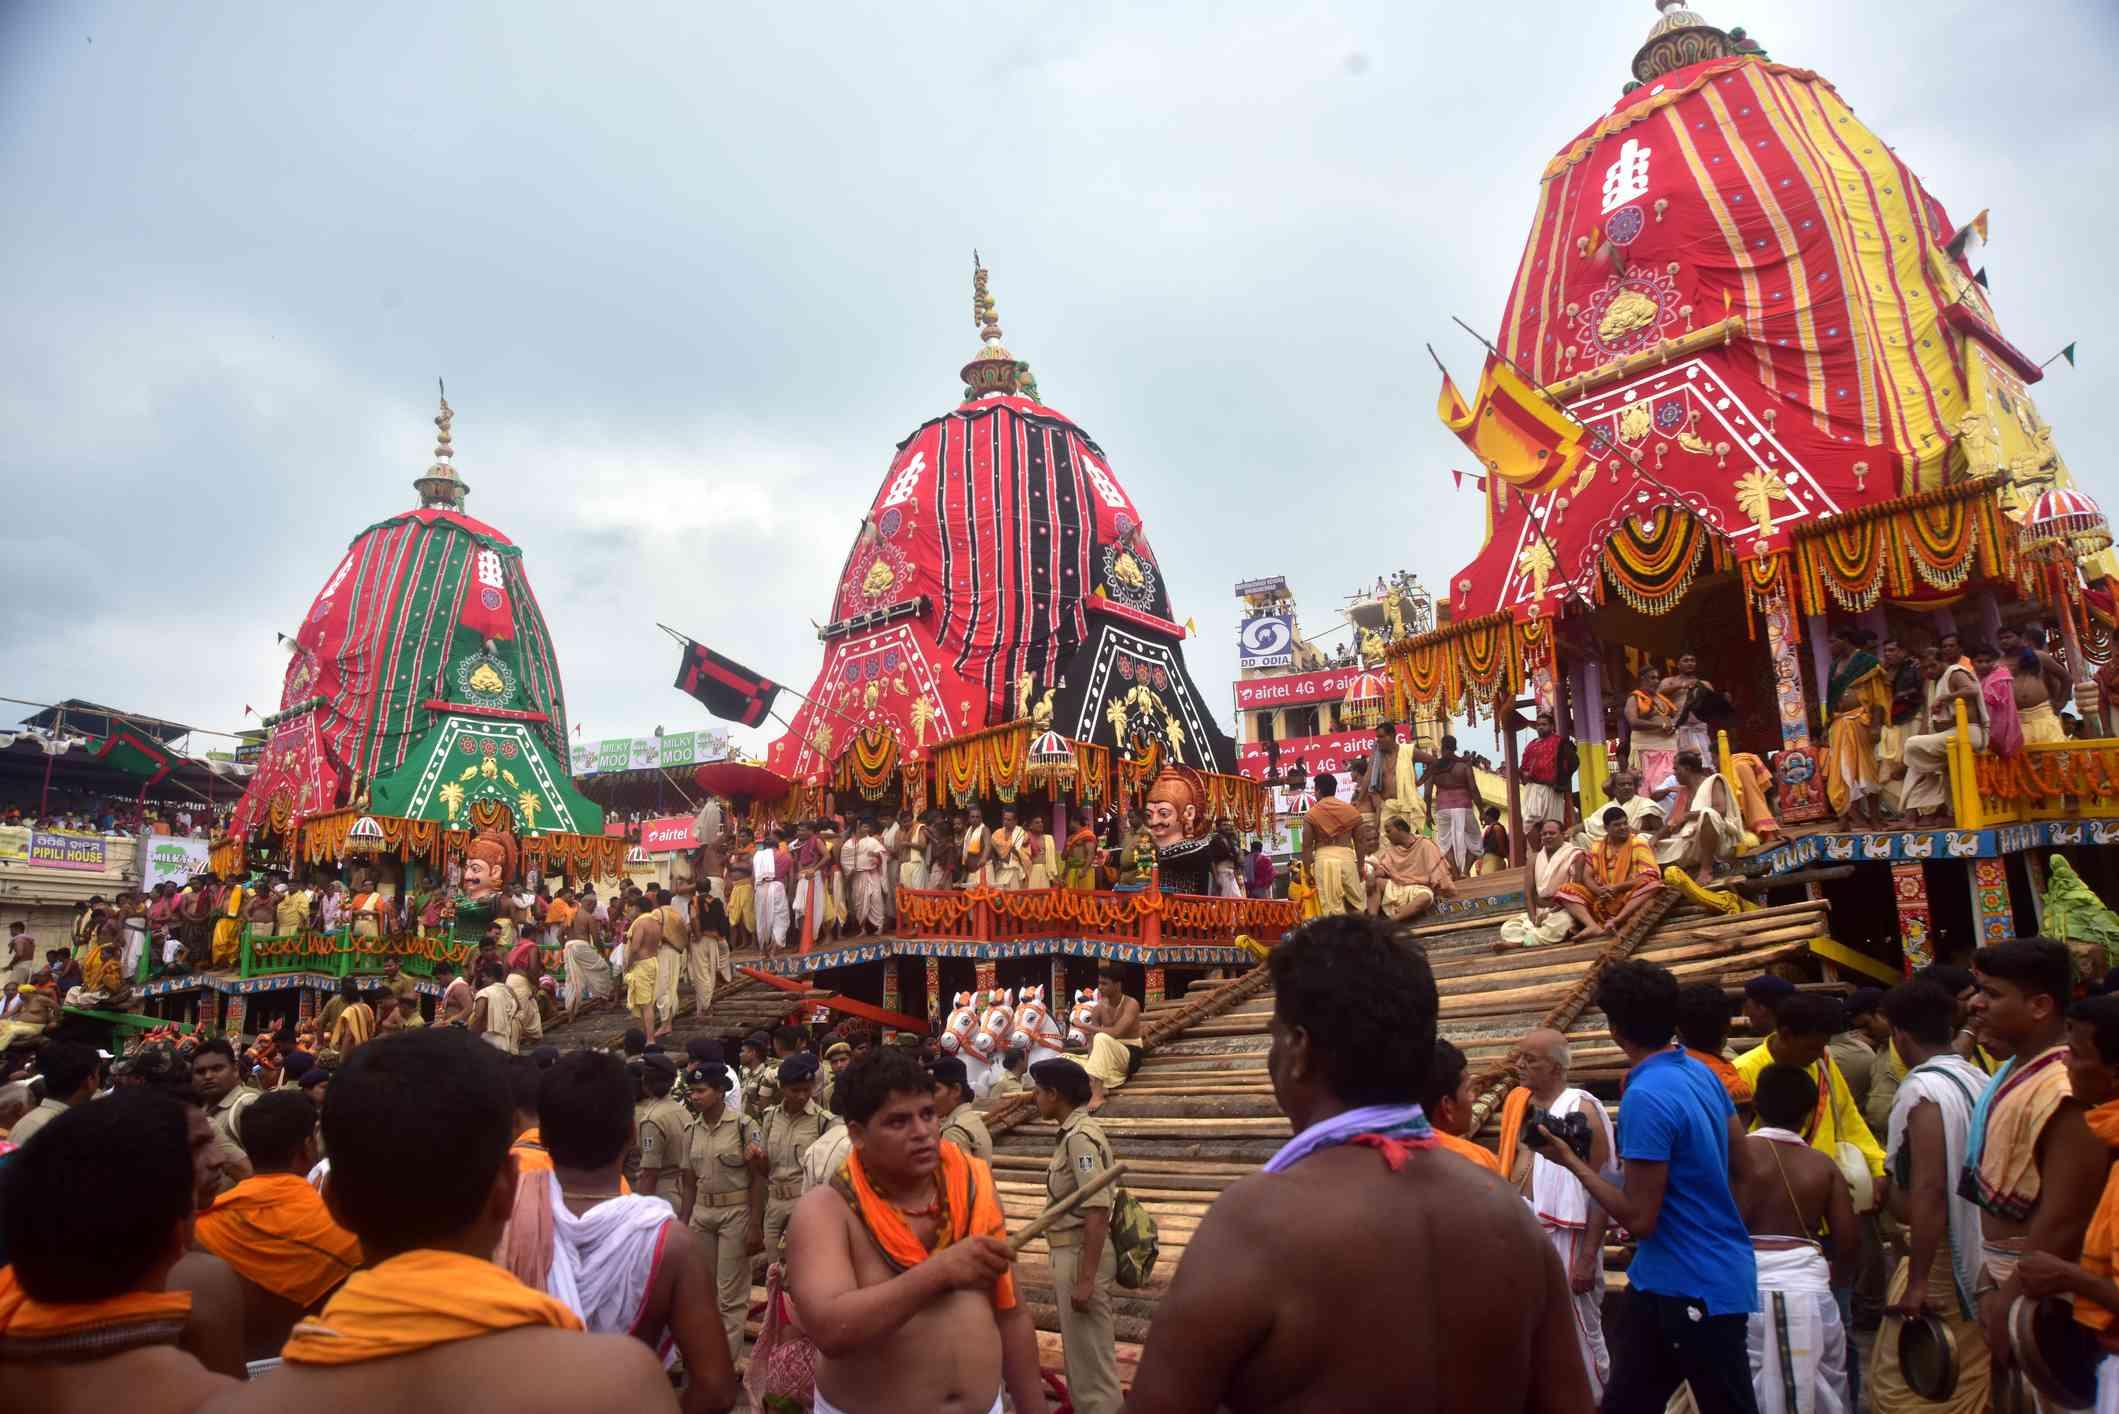 Puri Jagannath Temple in Odisha: Essential Visitor Guide